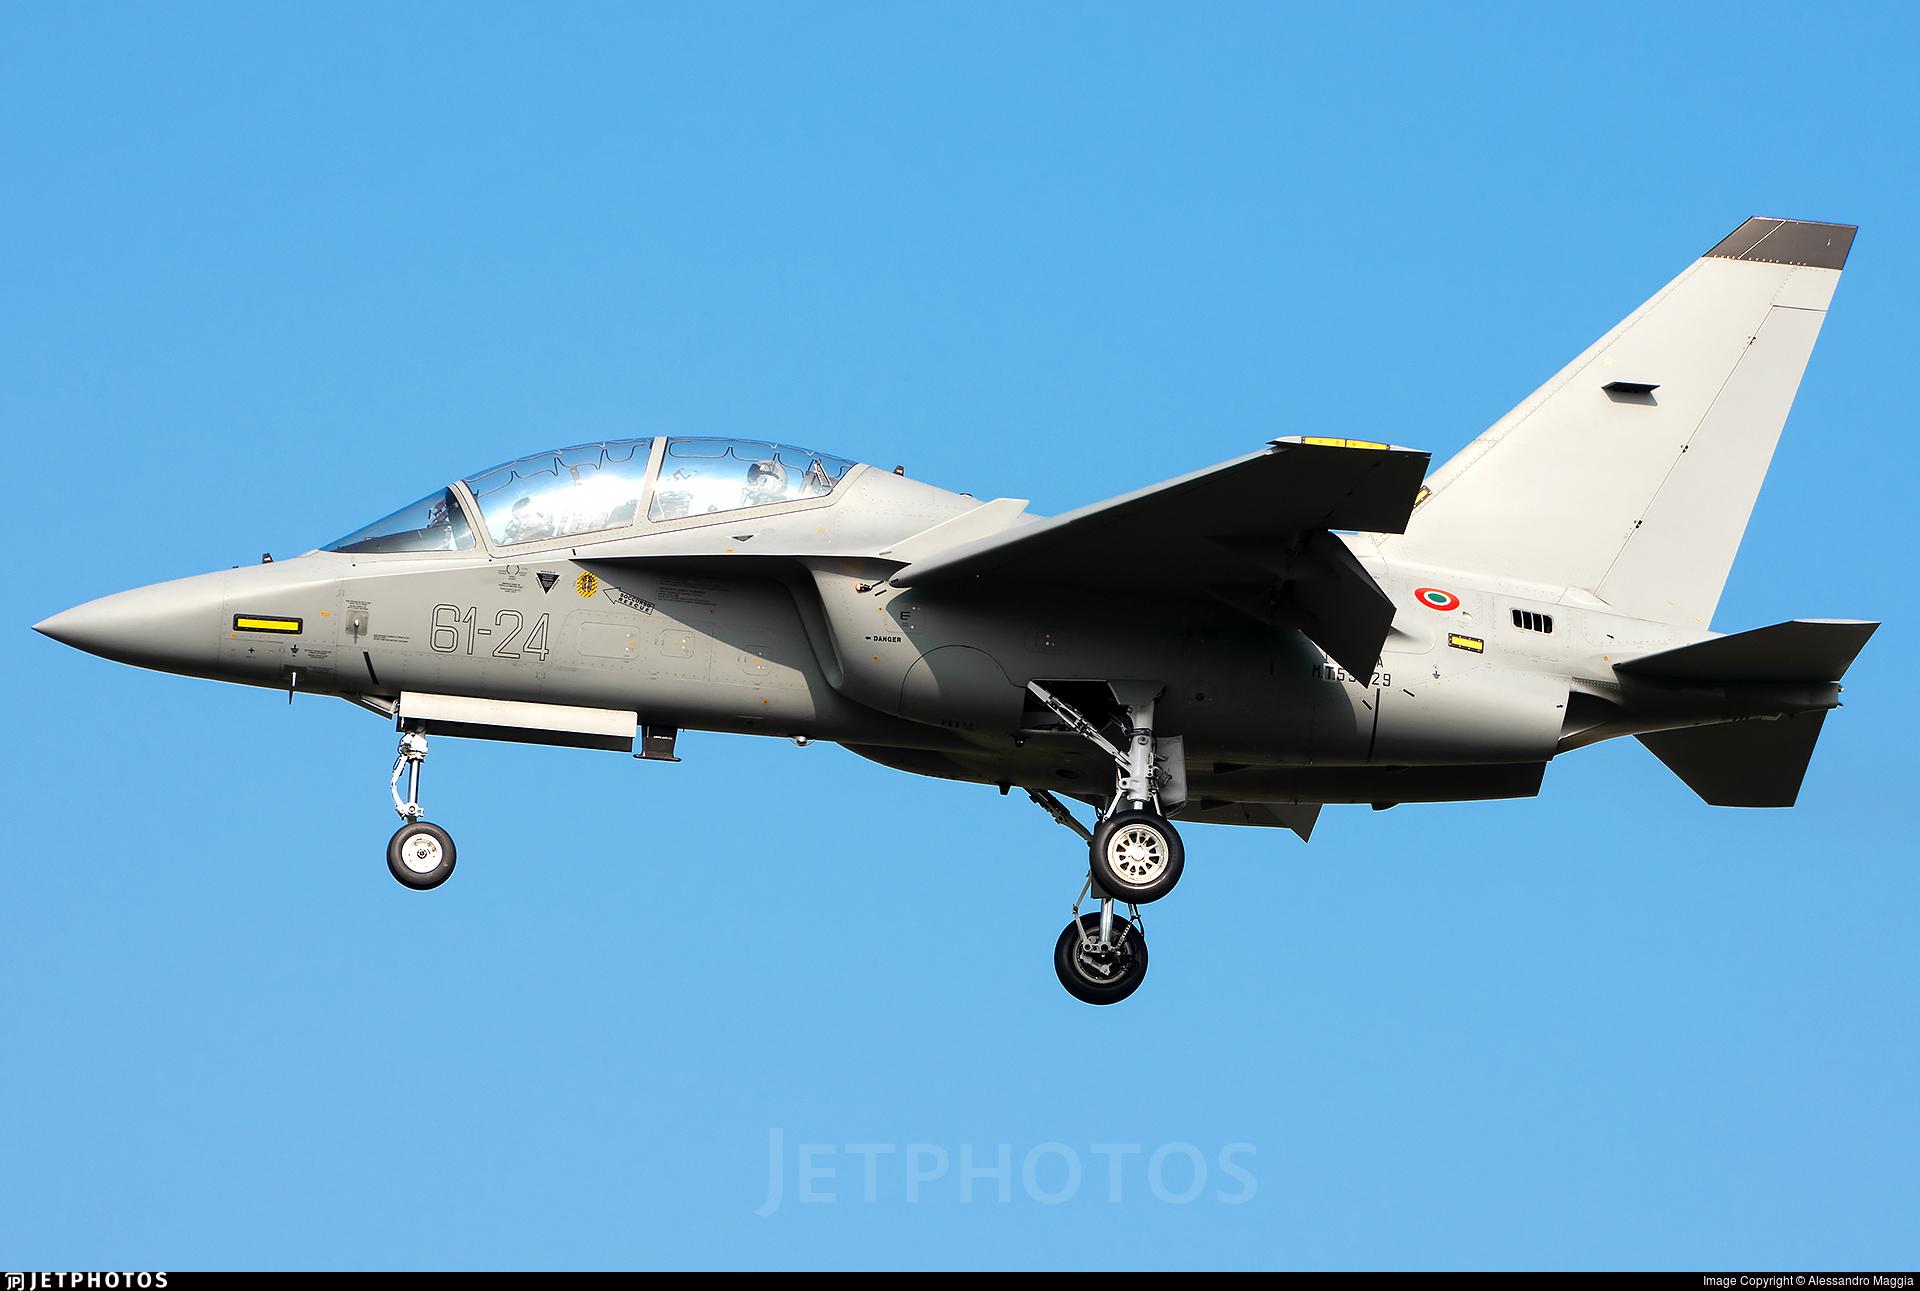 MT55229 - Alenia Aermacchi T-346A - Italy - Air Force